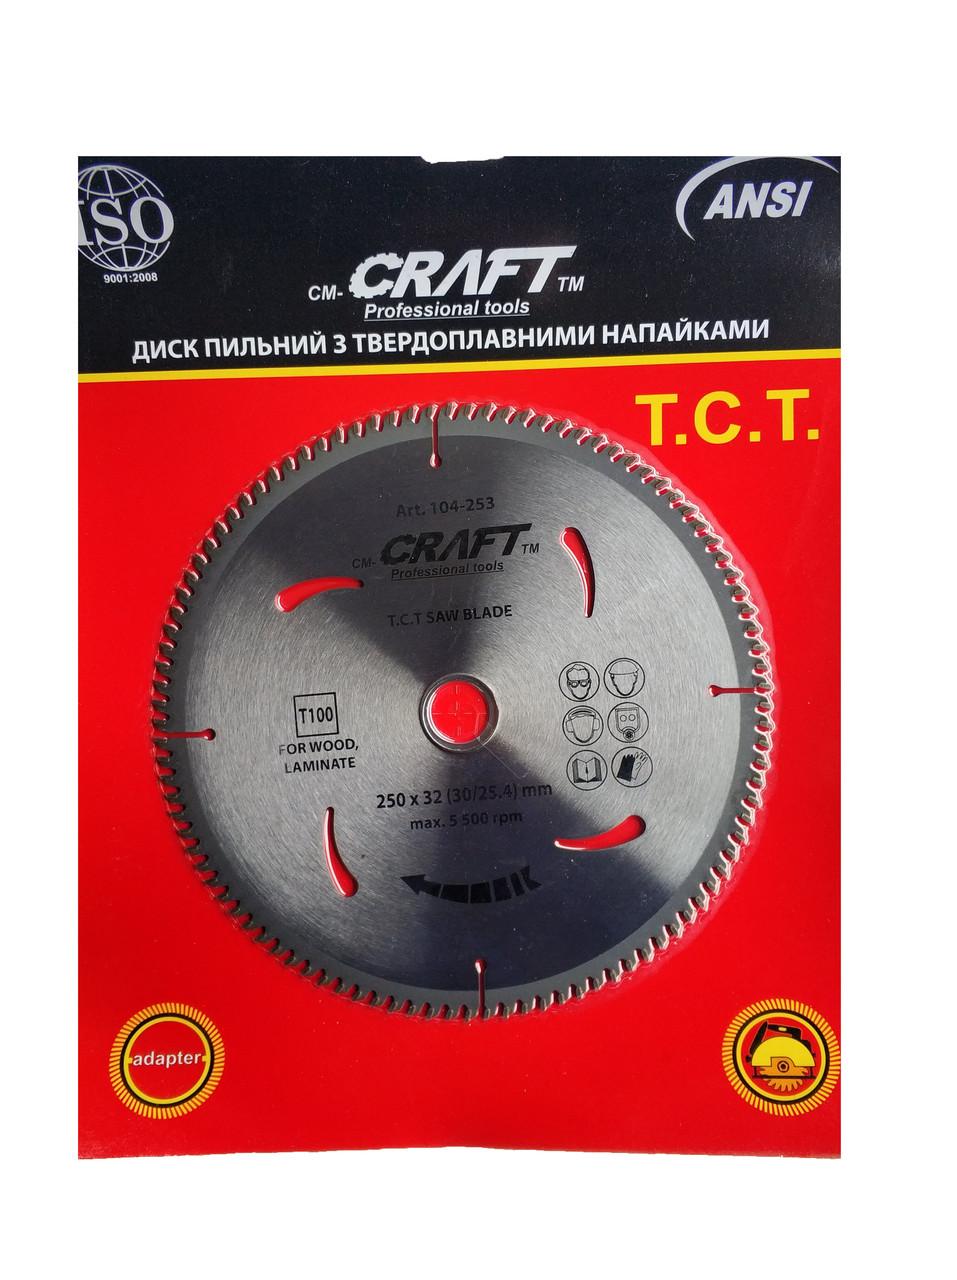 104253 Диск CRAFT пильний ТСТ 250*32(30/25.4)мм*100Т для ламинату та деревини